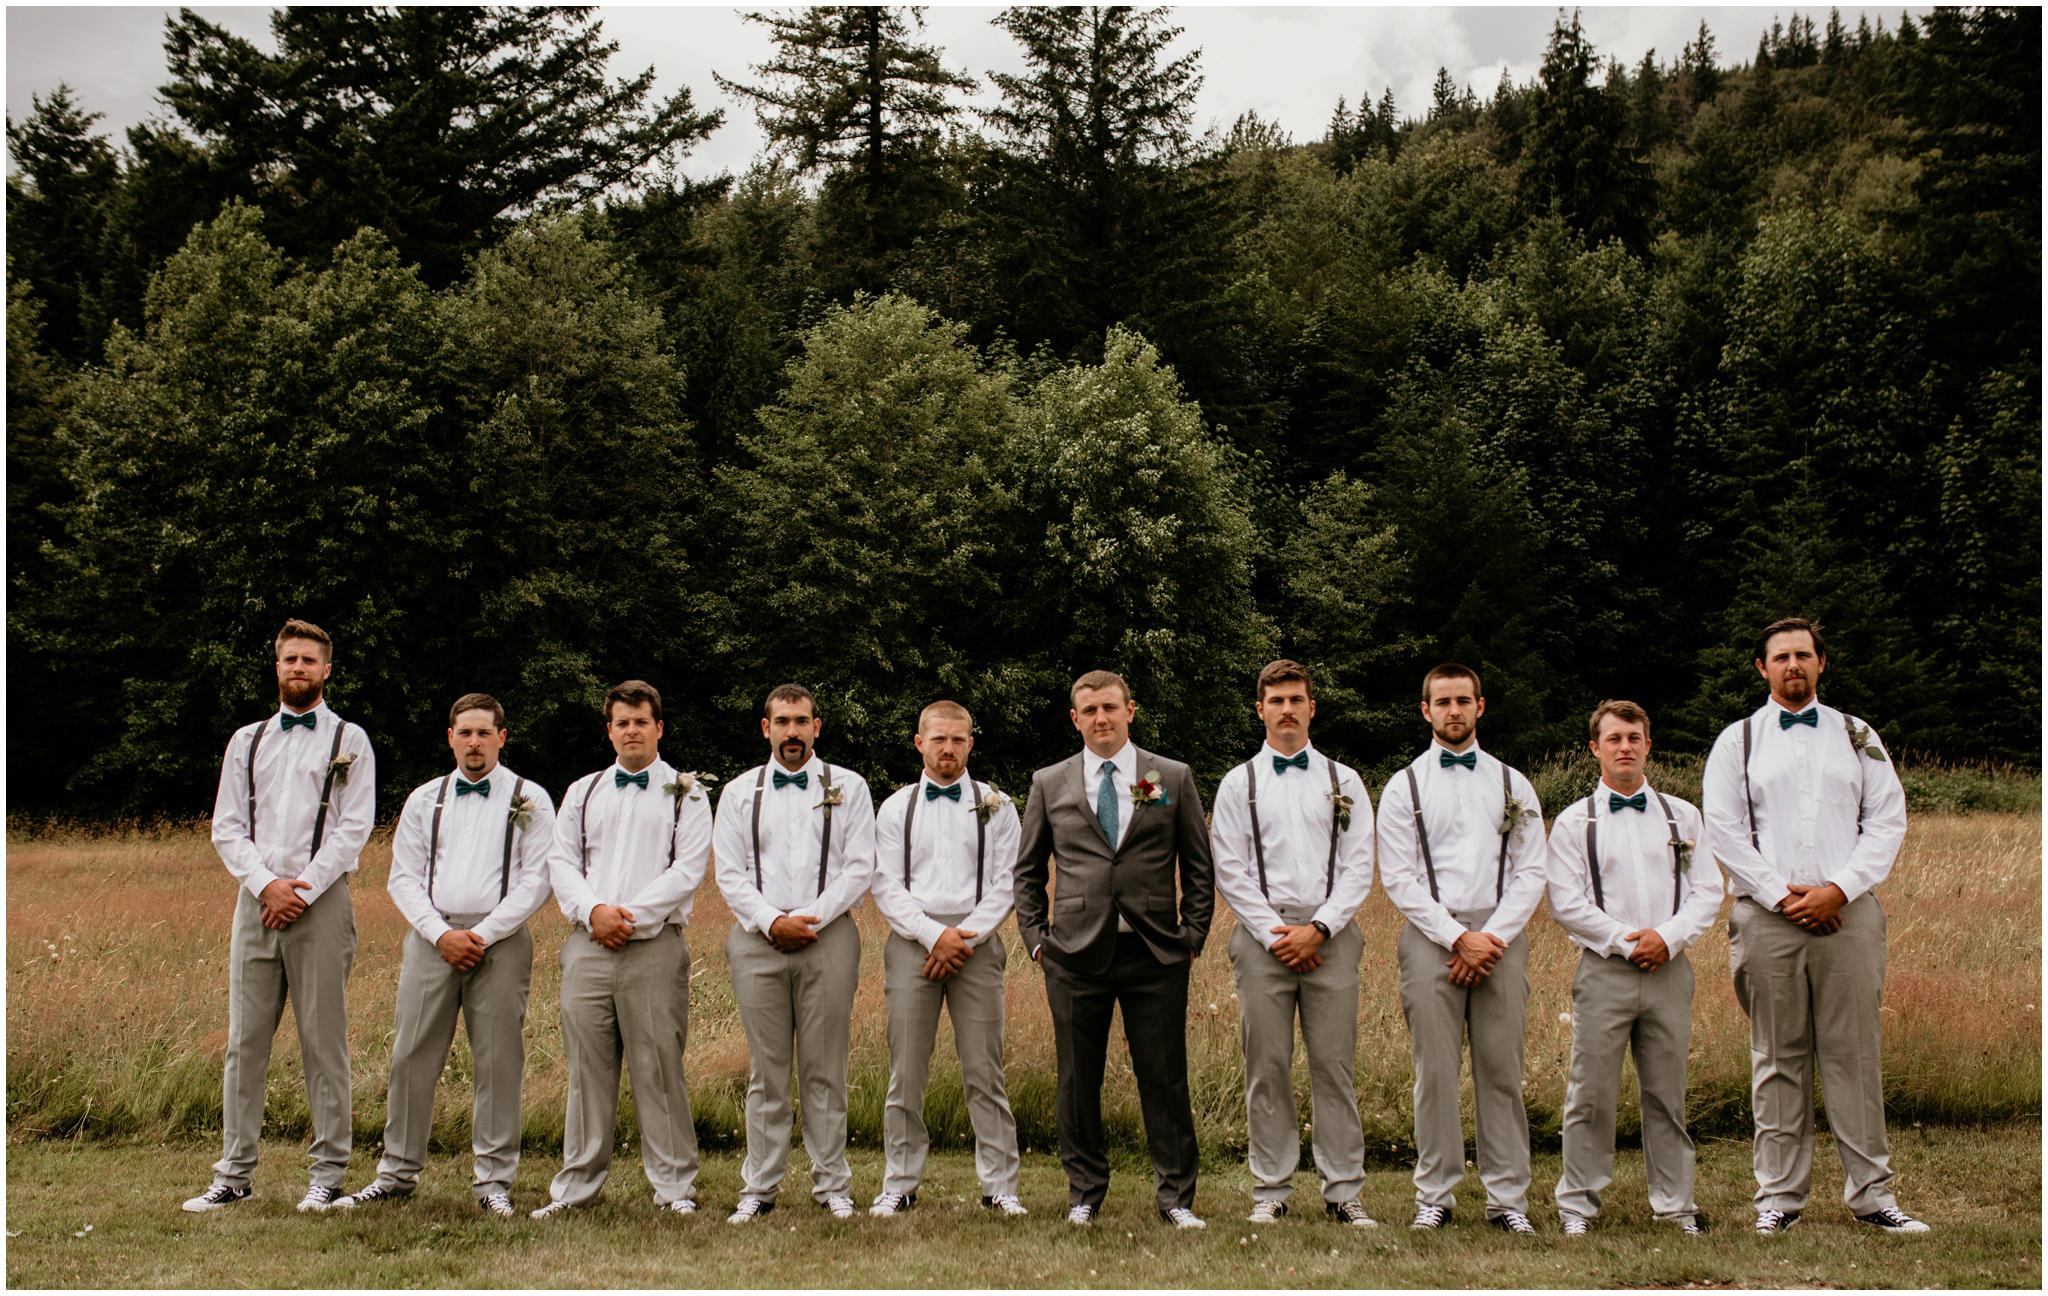 alex-and-matthew-three-cs-farm-venue-seattle-wedding-photographer-075.jpg